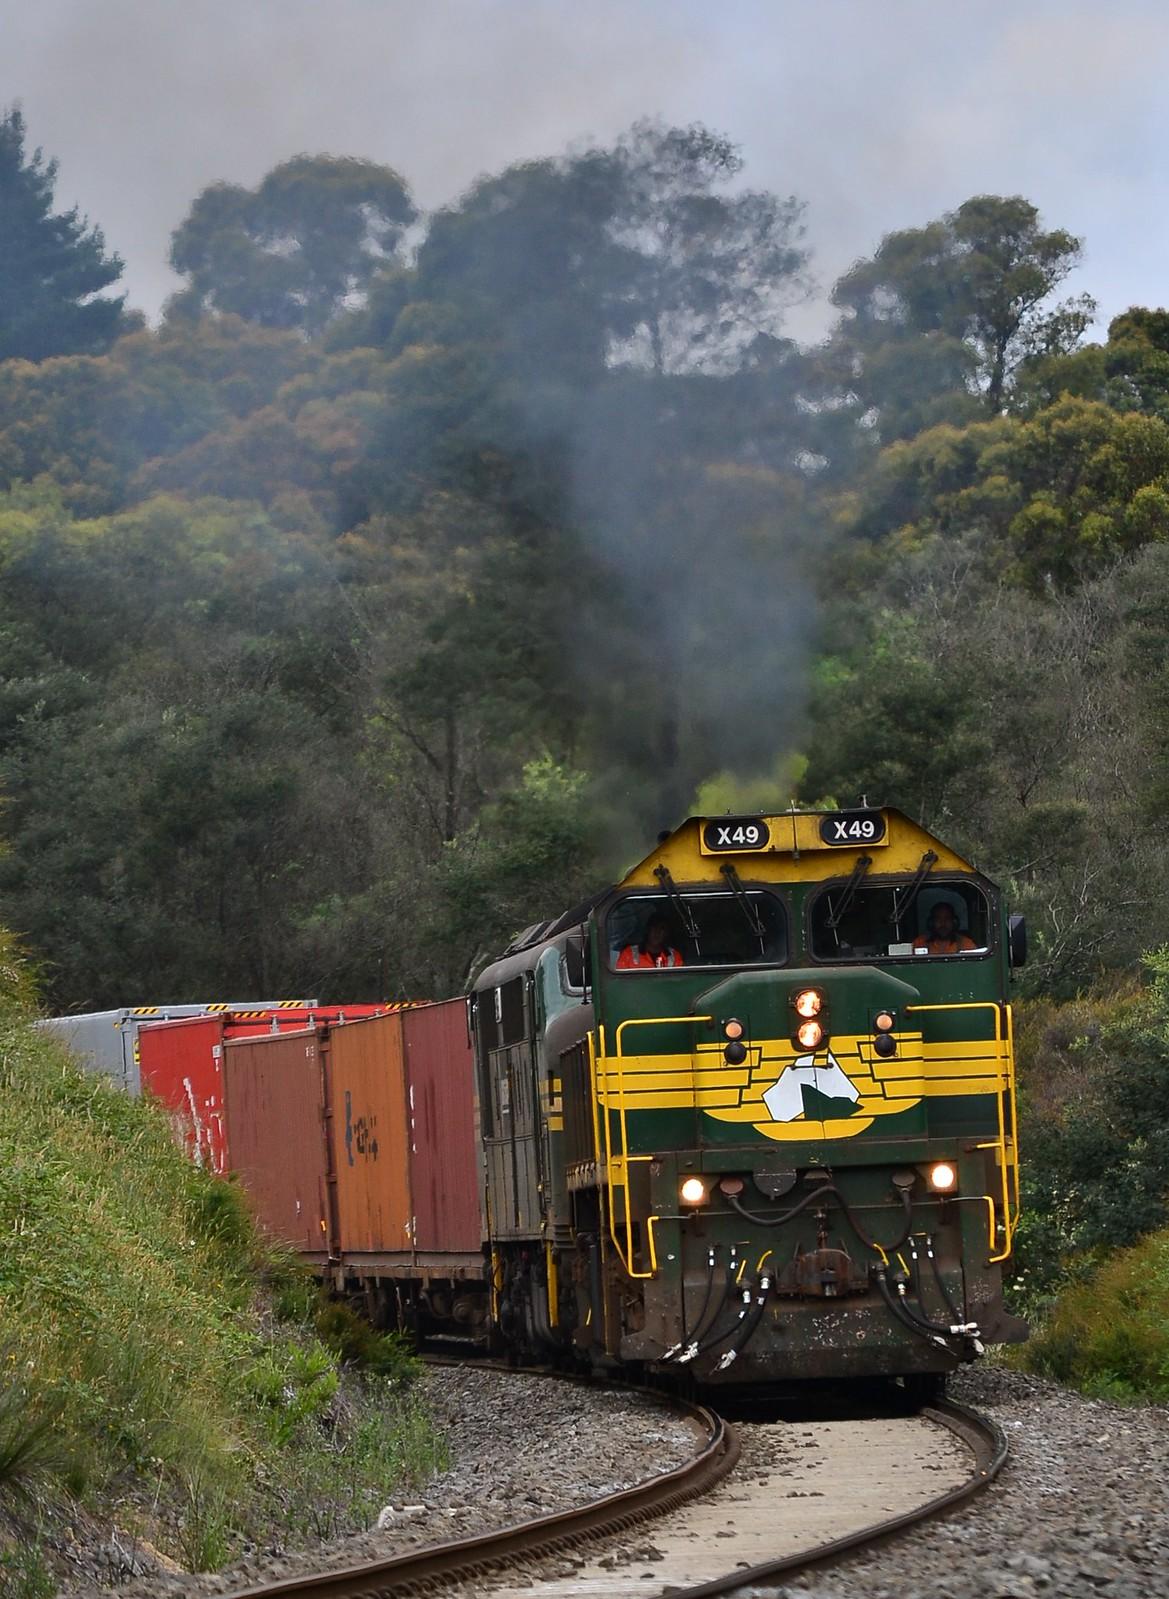 Paper train by Jarle D